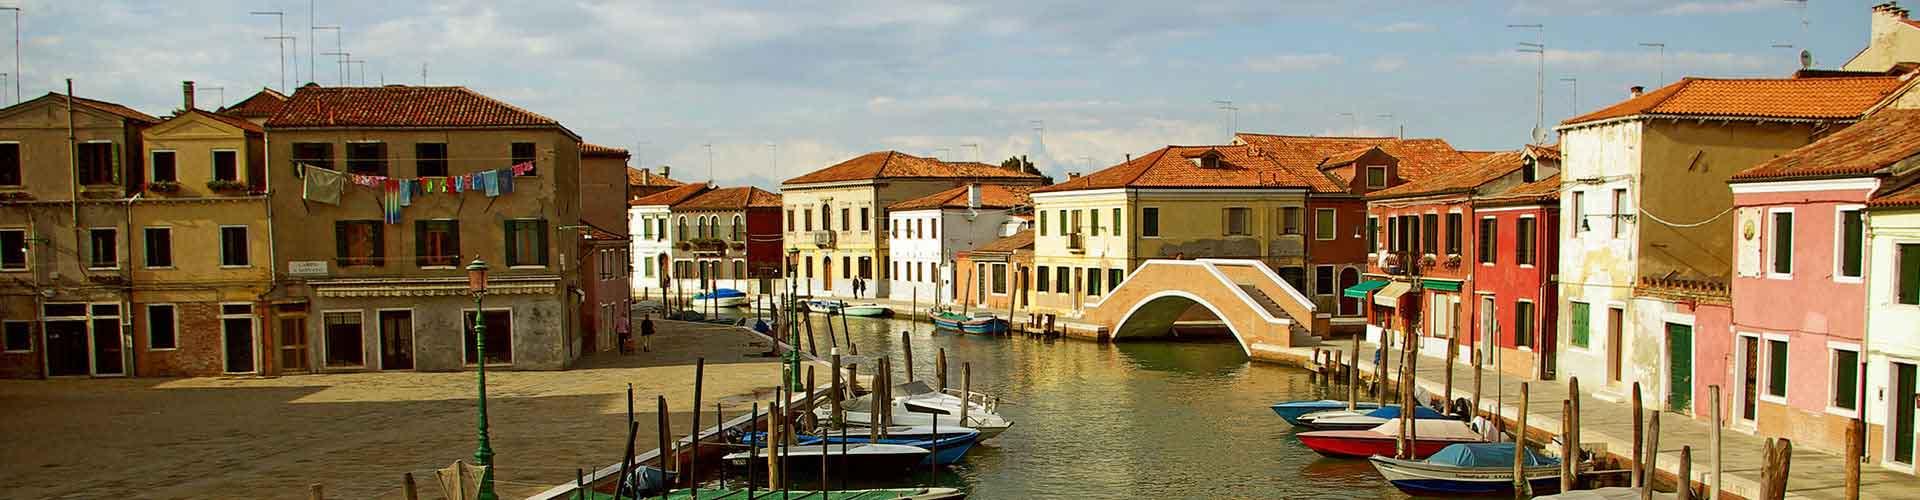 Venezia Mestre – Camere a Venezia Mestre. Mappe per Venezia Mestre, Foto e  Recensioni per ogni Camera a Venezia Mestre.